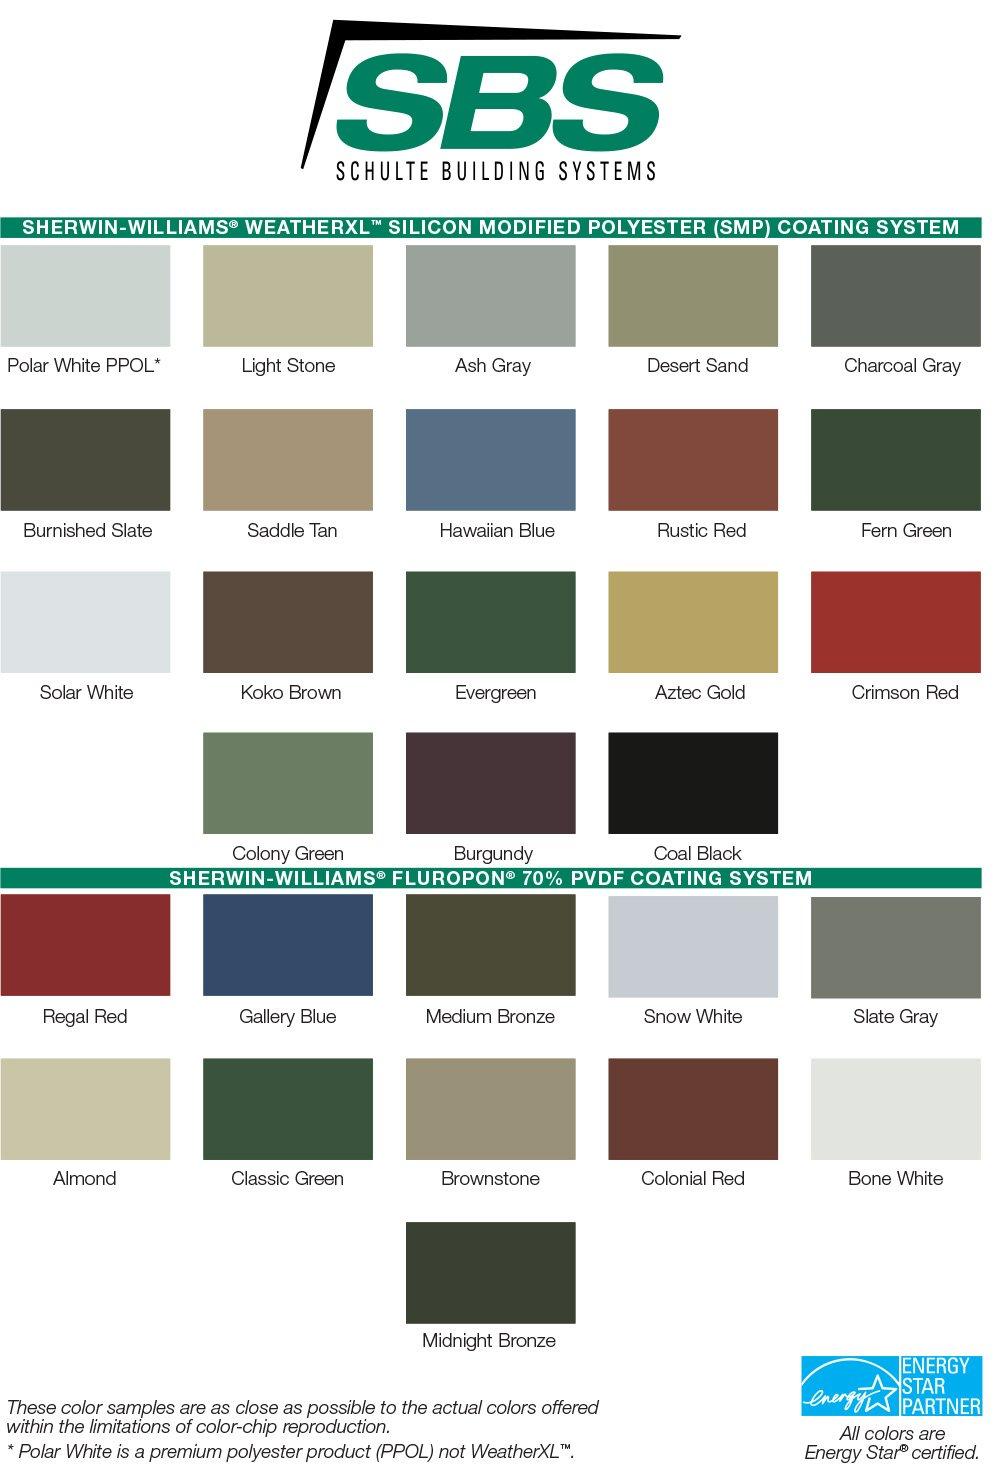 SBS Color Guide 2020